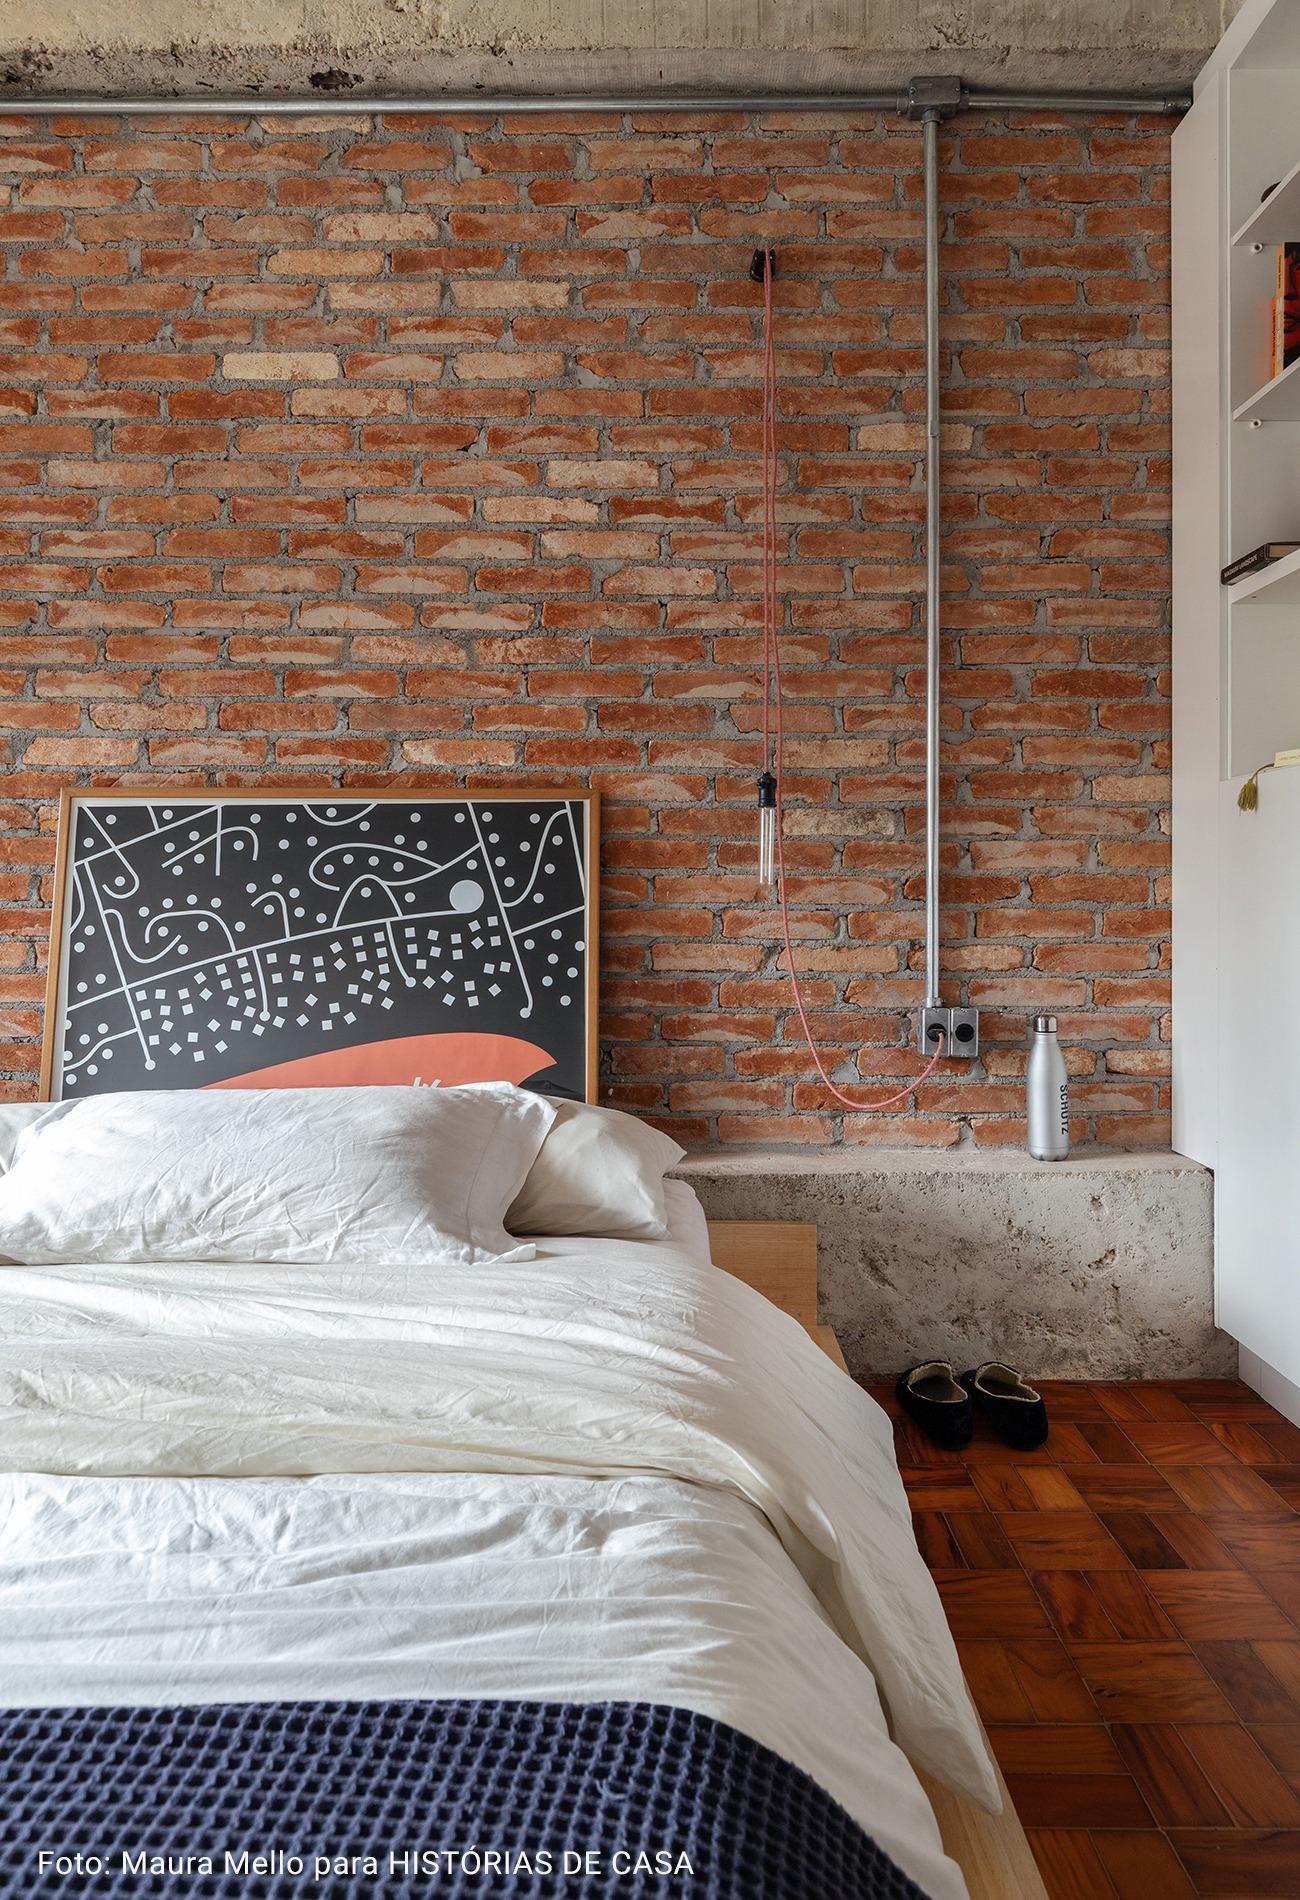 cama com coberta de tricot